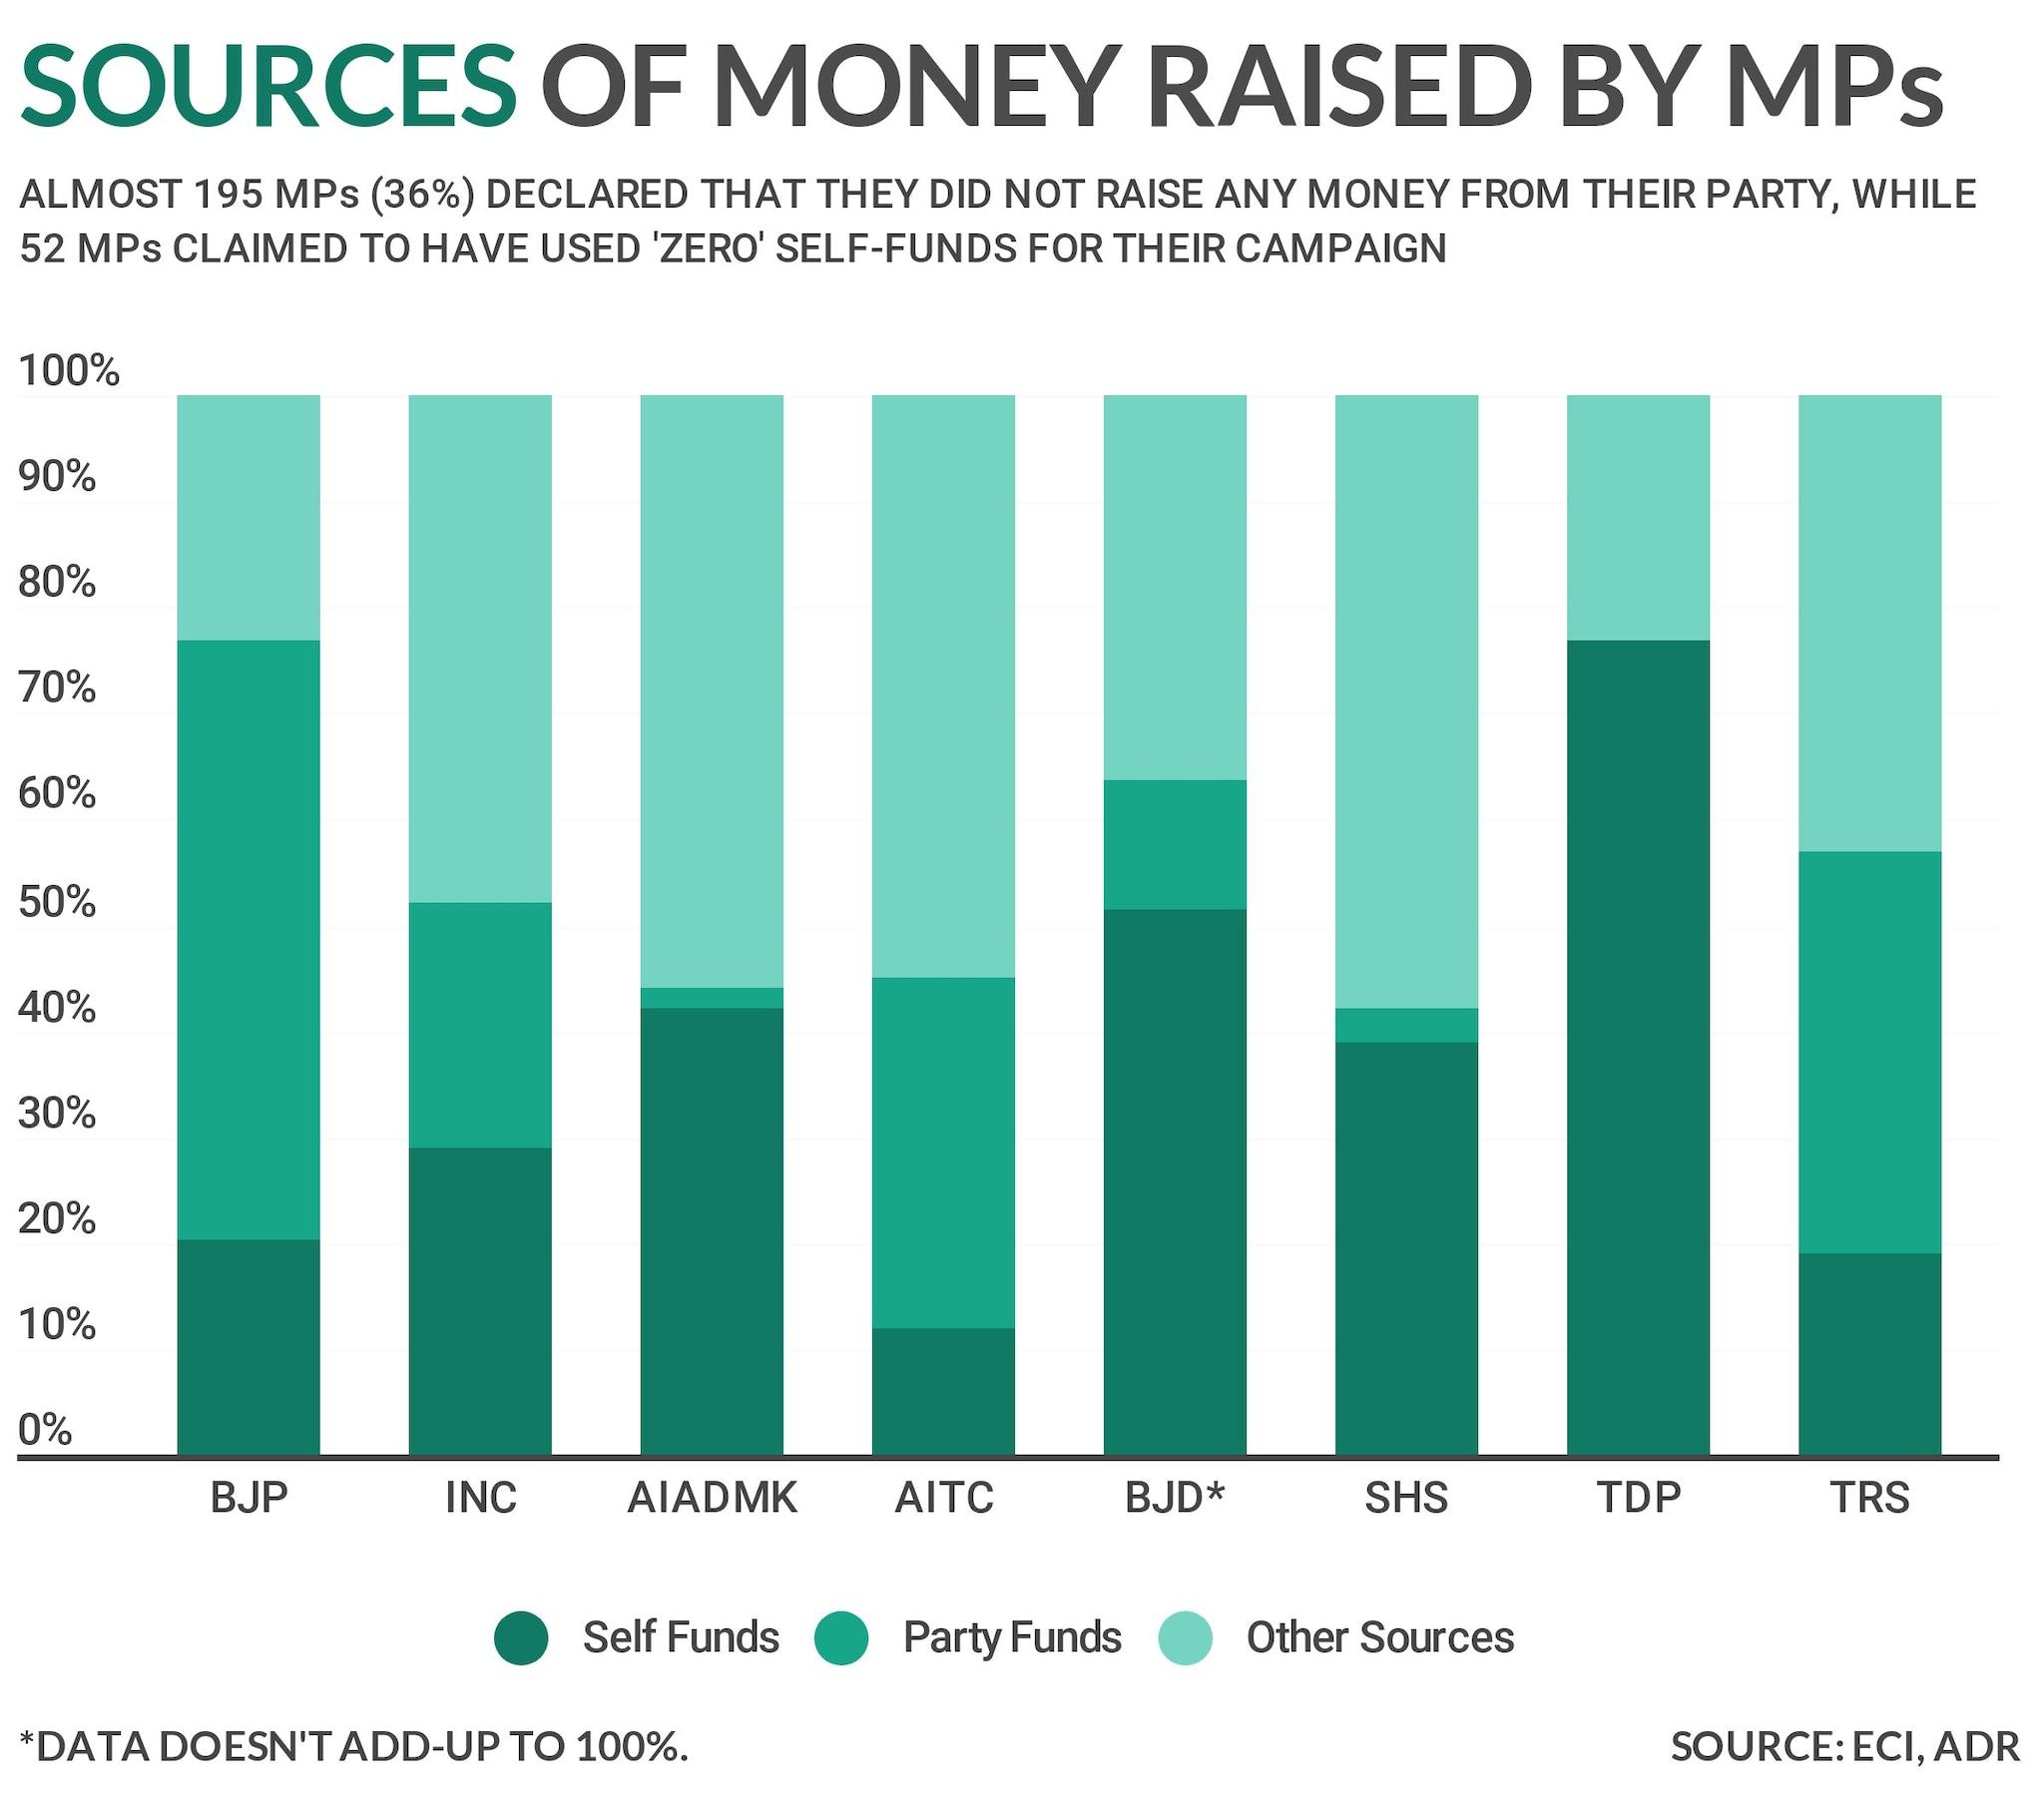 sources-of-money-raised